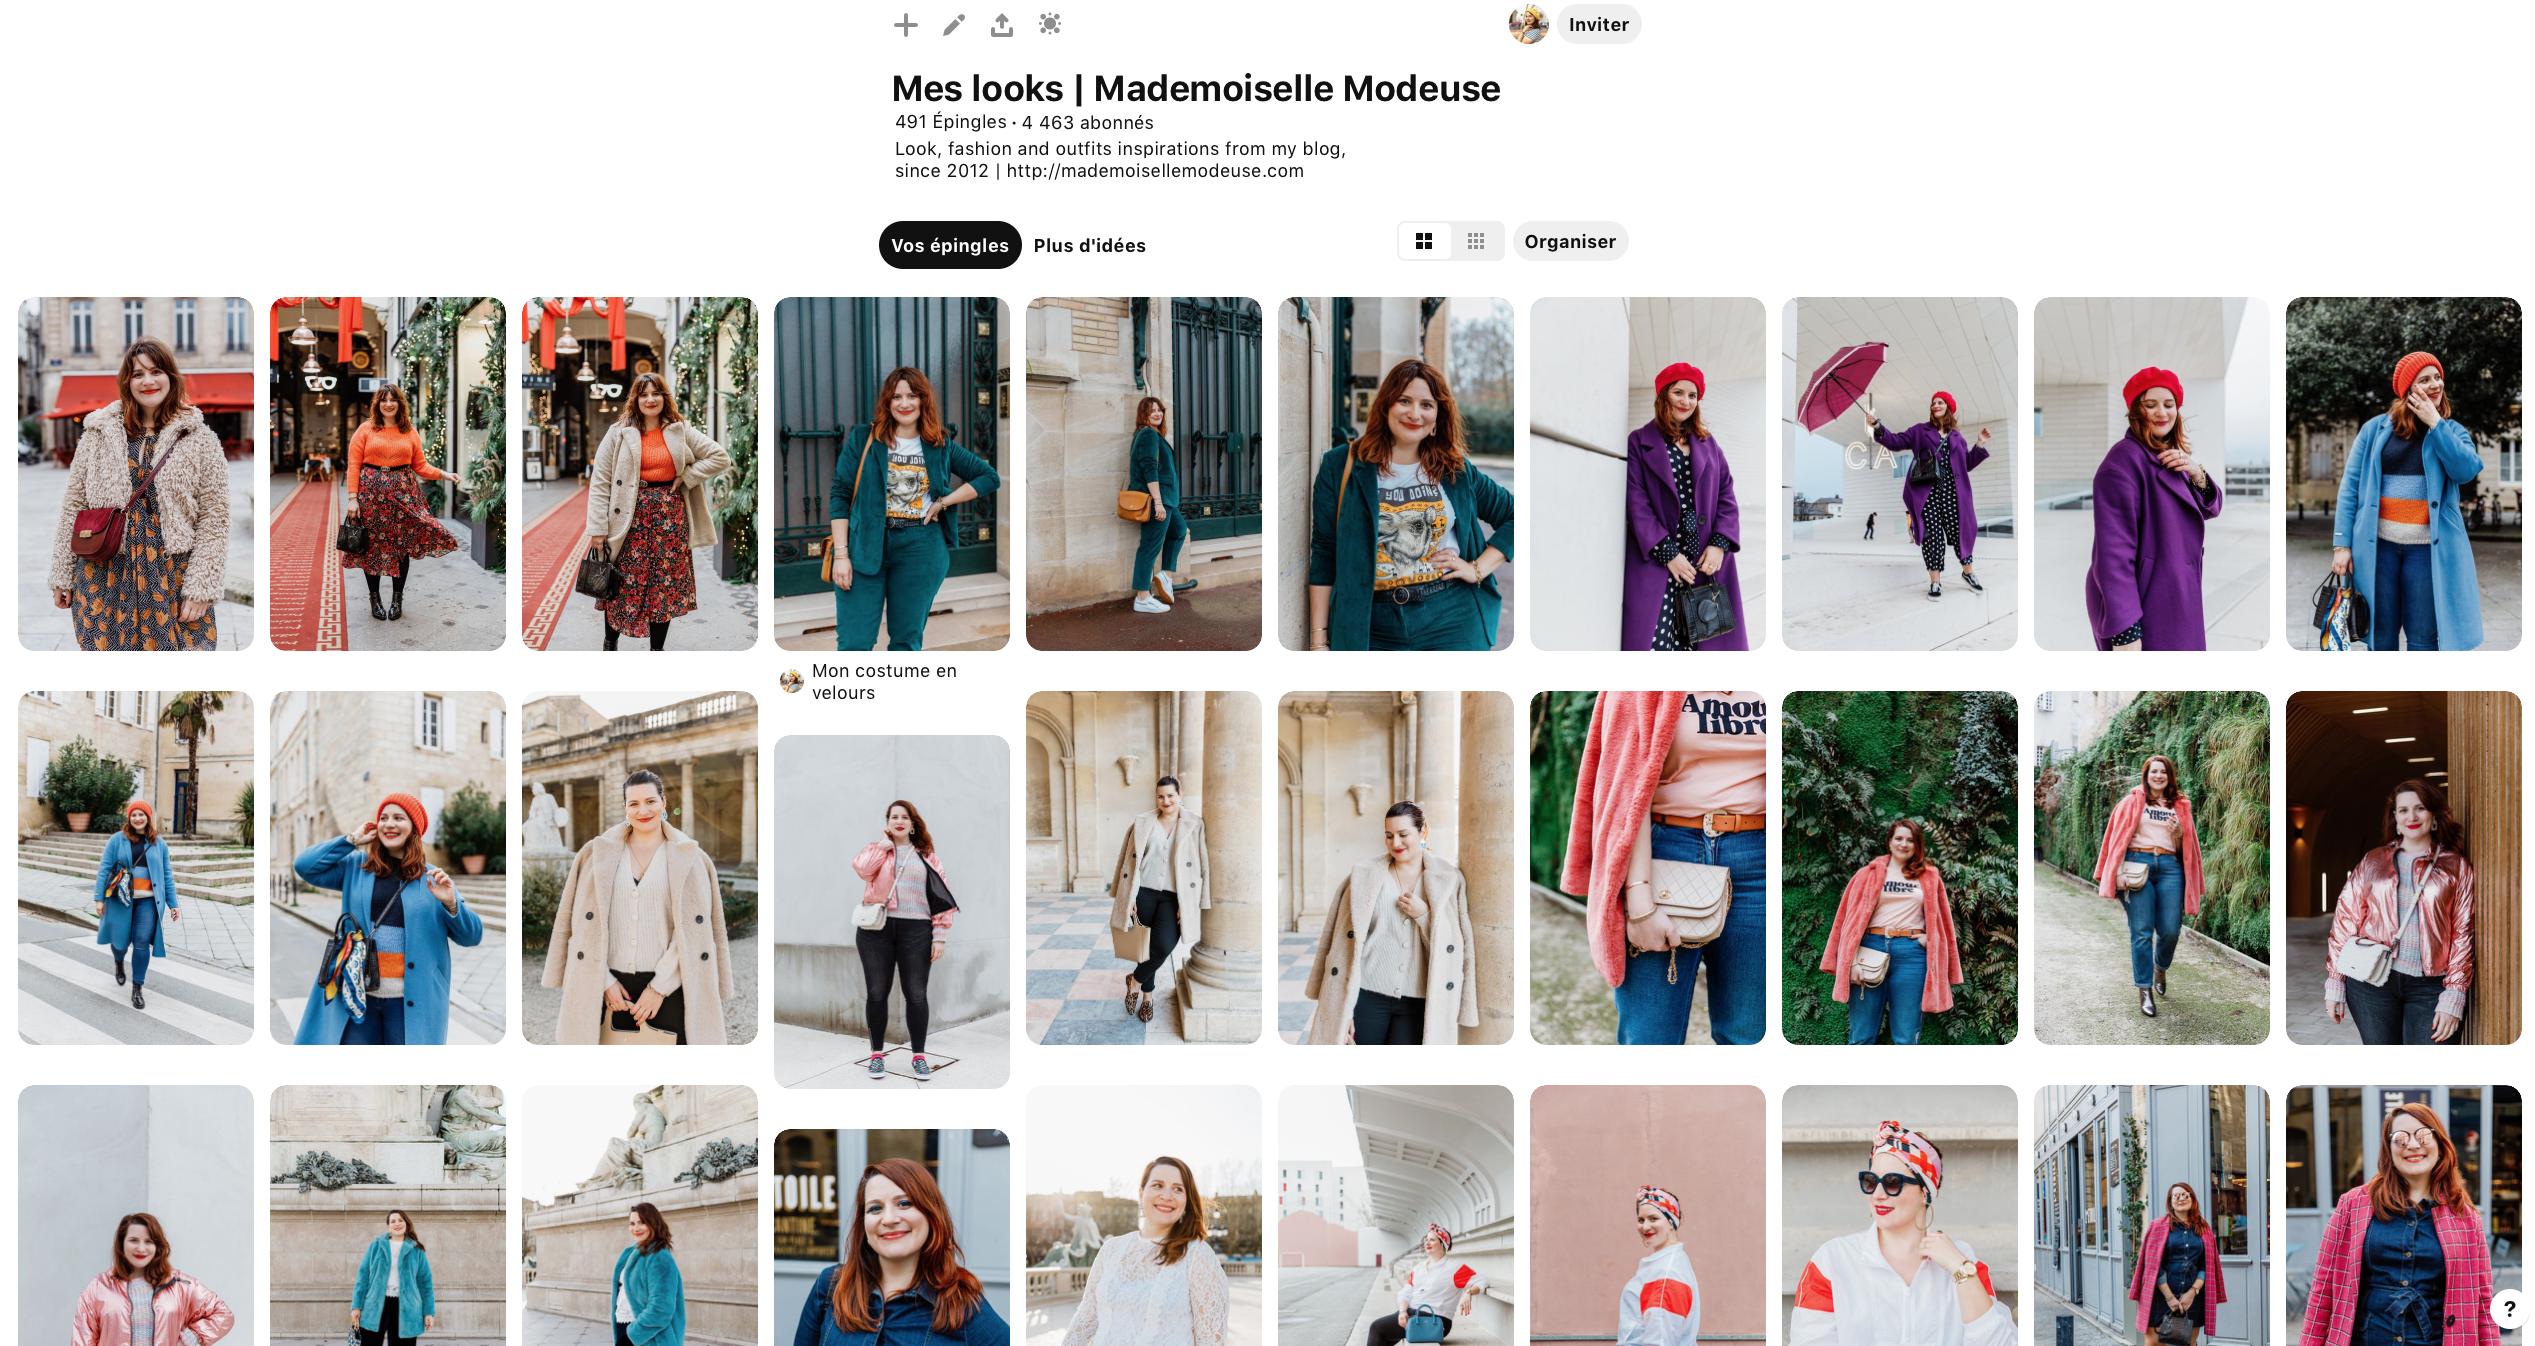 mademoiselle-modeuse-pinterest